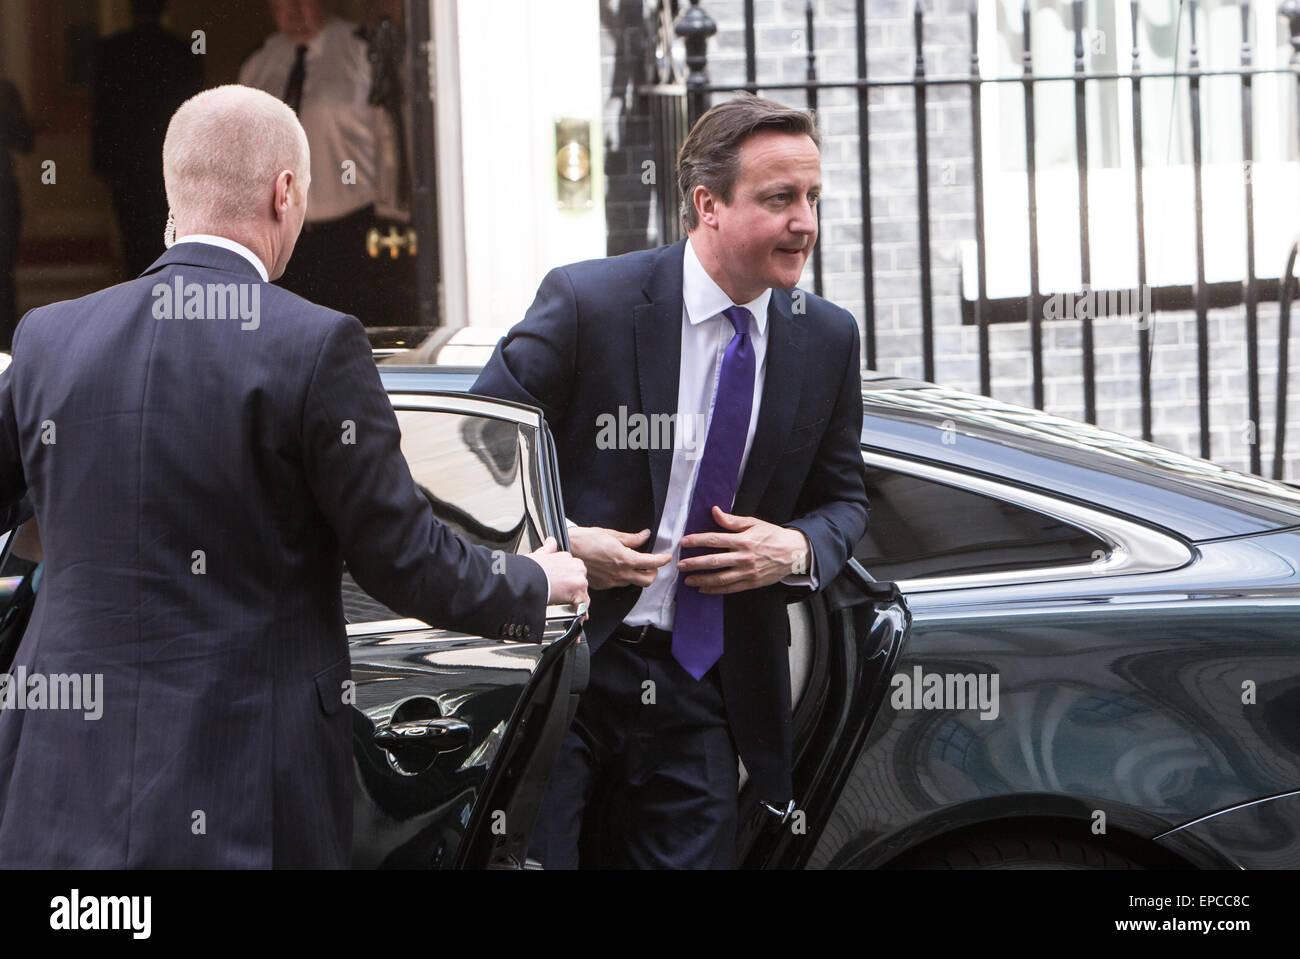 Premierminister David Cameron, kommt in der Nummer 10 Downing street Stockfoto